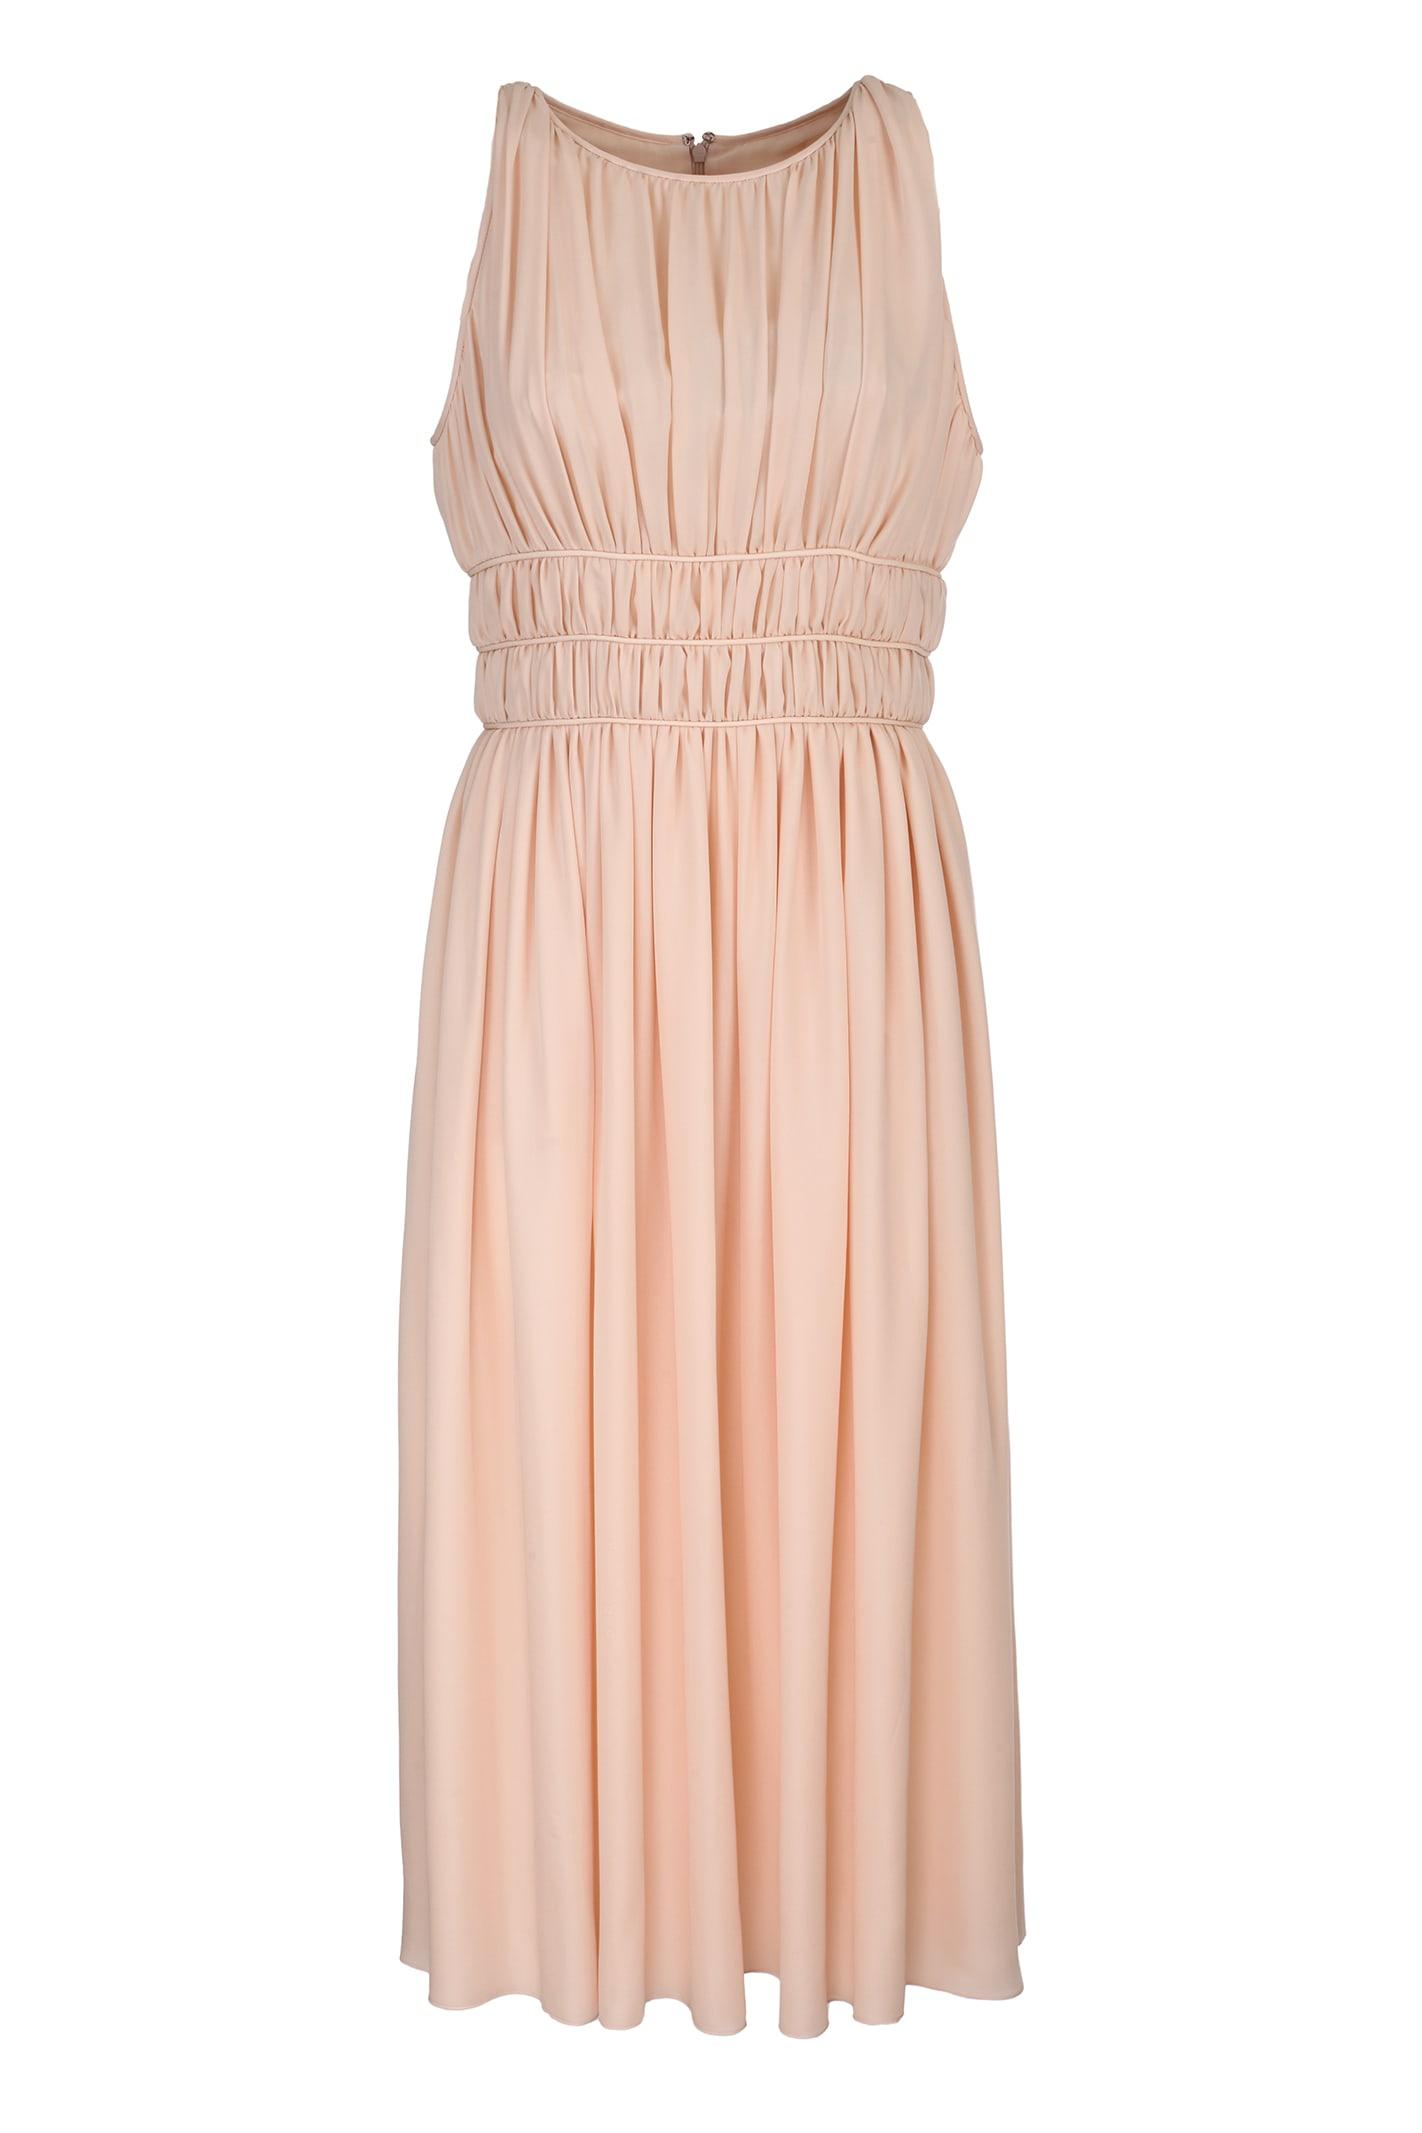 Buy Emporio Armani Maxi Dress online, shop Emporio Armani with free shipping